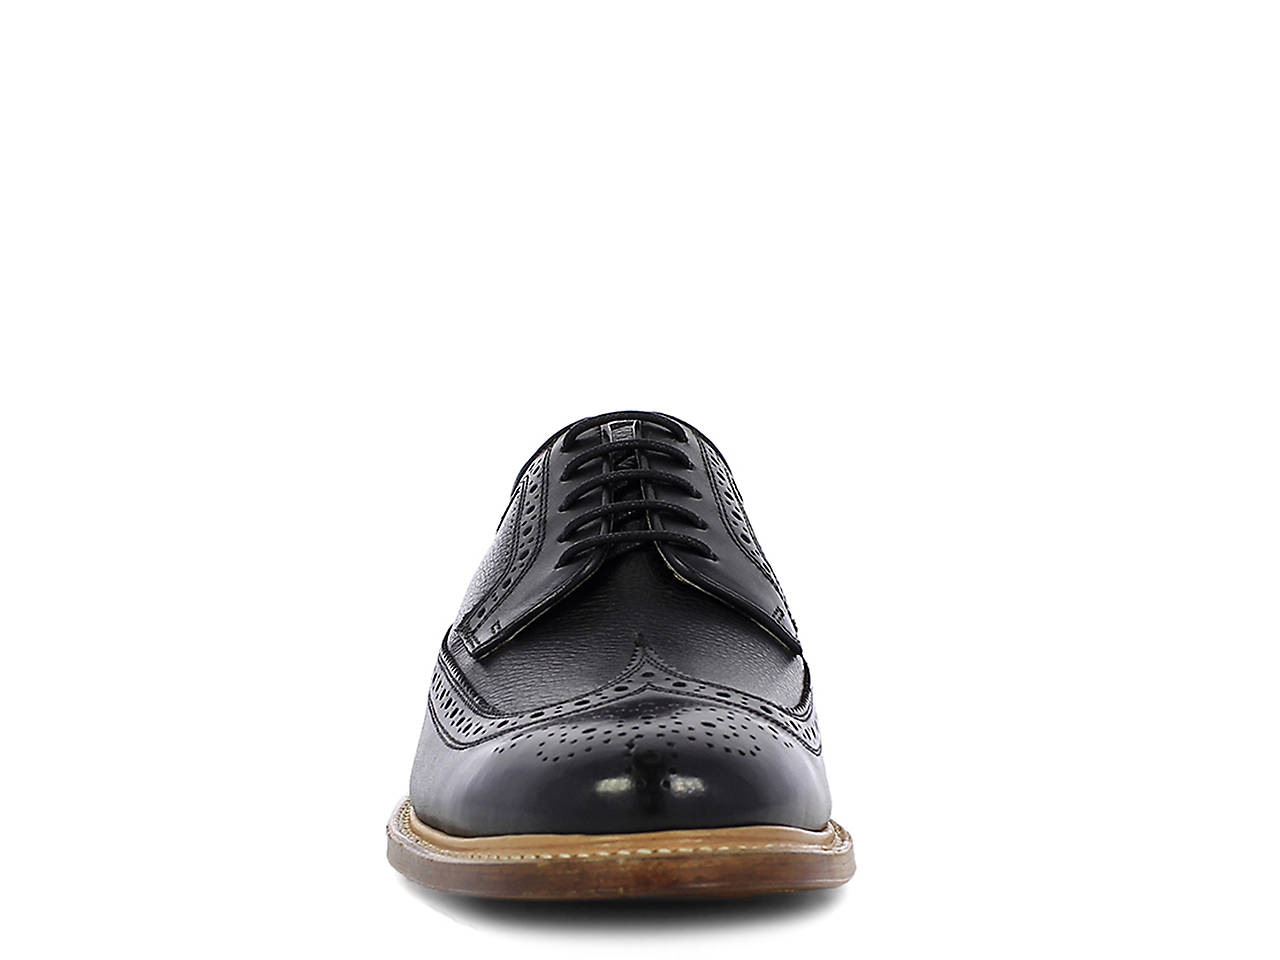 92474b5937c Florsheim Heritage Wingtip Oxford Men s Shoes